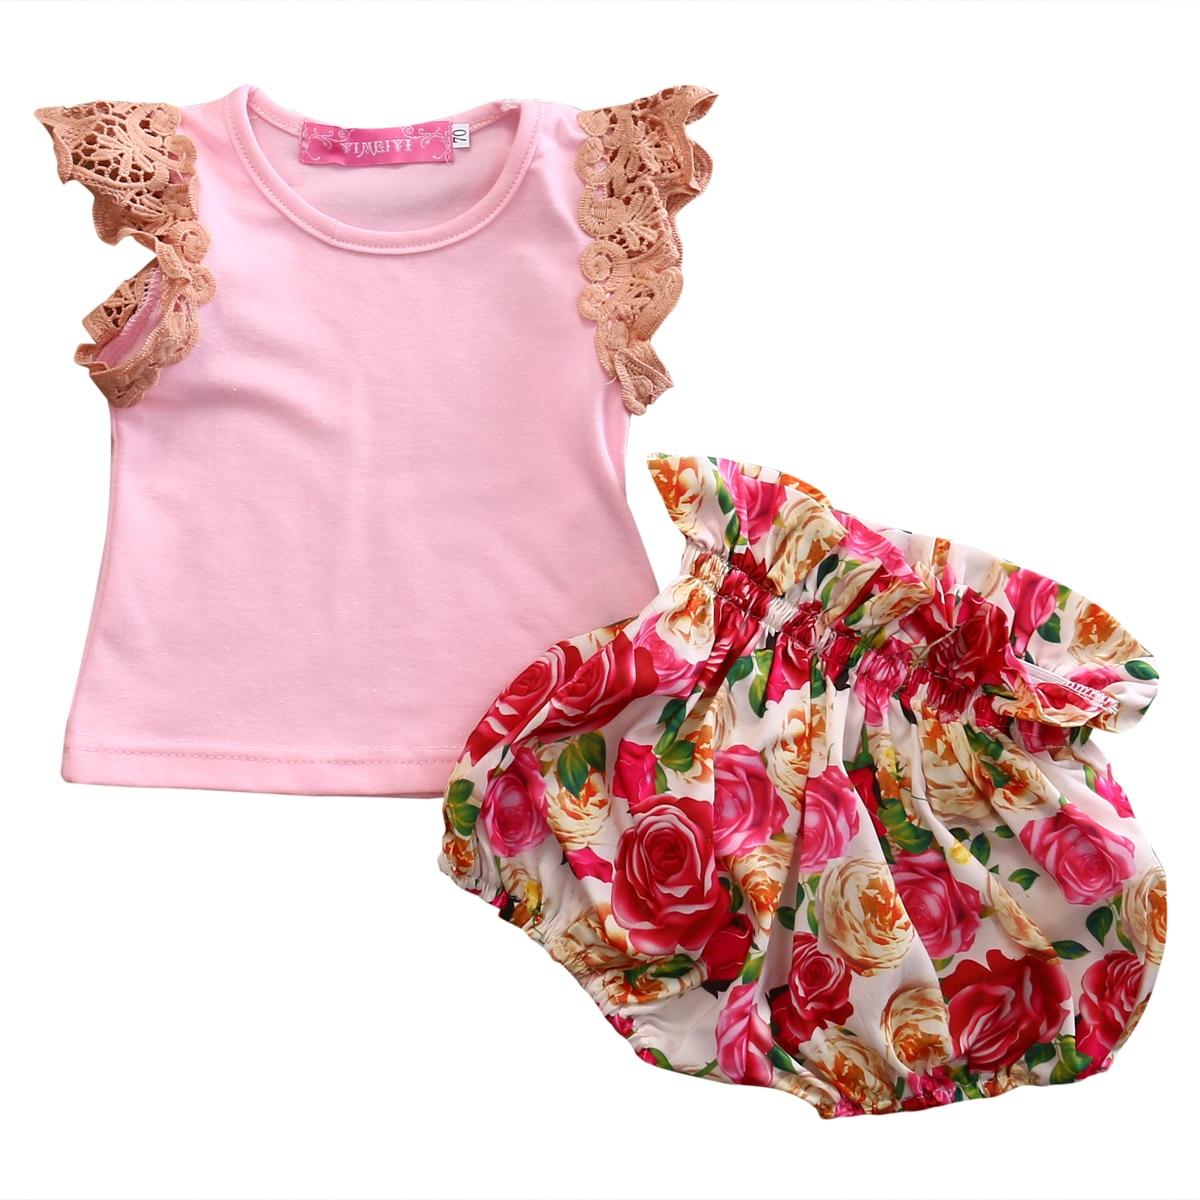 T shirt Tops Sleeveless Cute Floral Shorts Summer Ruffles Shorts Clothing Outfits Set 2pcs Baby Kids Girls Clothes Set Lace майка sleeveless t shirt deha с кружевными вставками